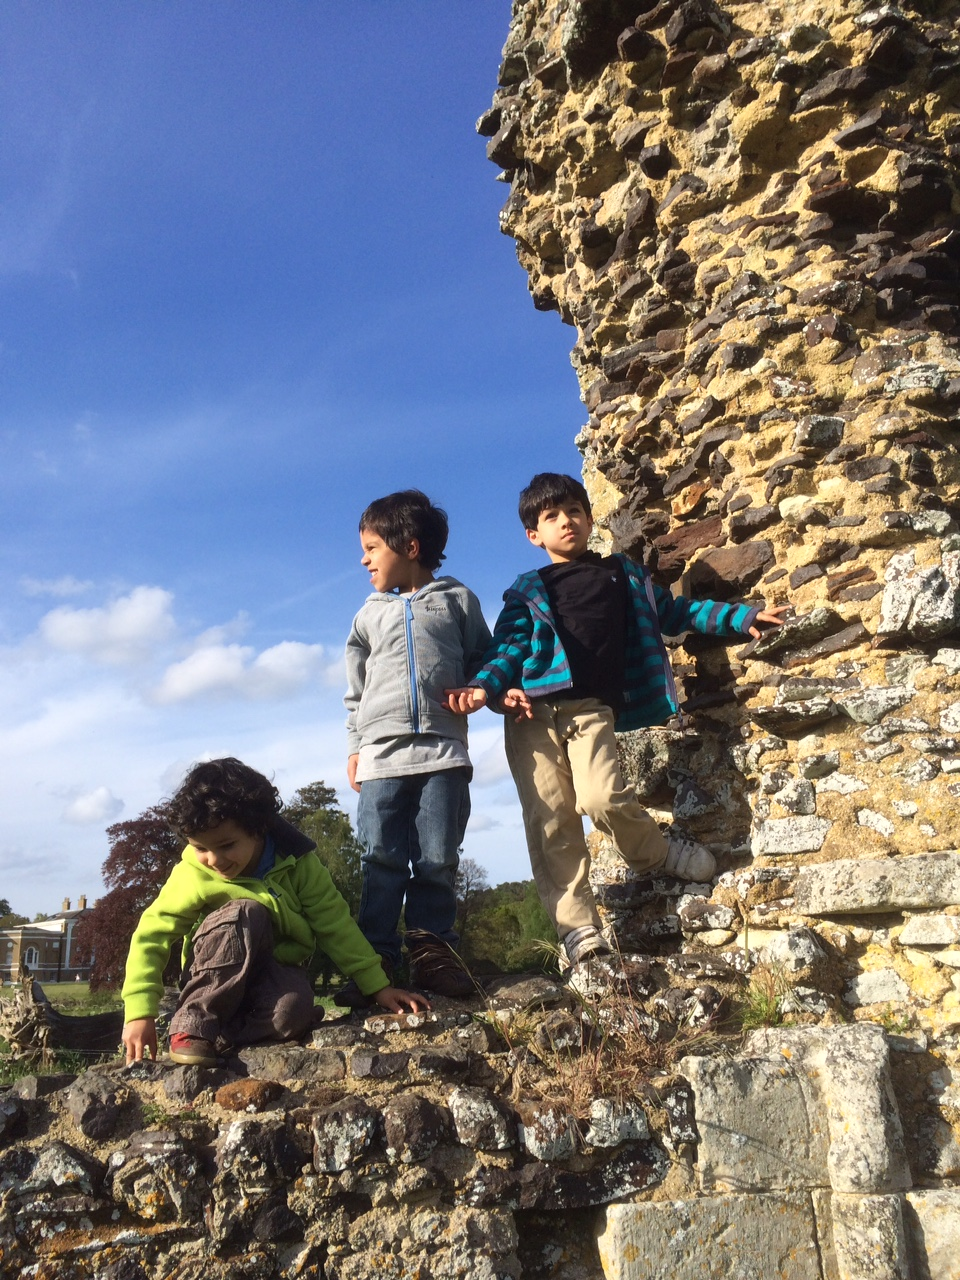 waverley abbey ruins and trespass boys fleeces